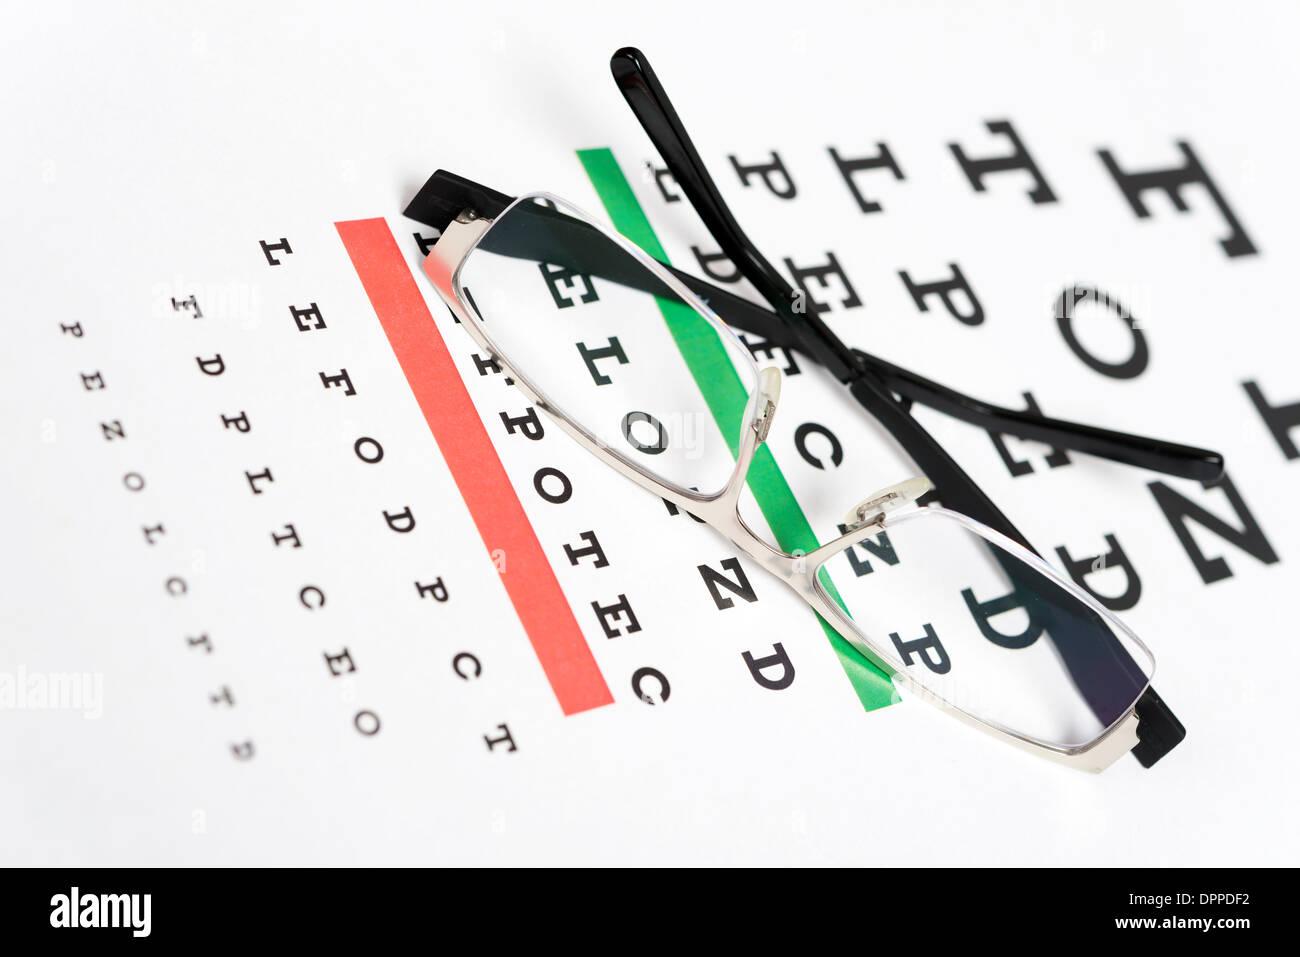 Eyeglasses on the eye chart background stock photo royalty free eyeglasses on the eye chart background nvjuhfo Image collections